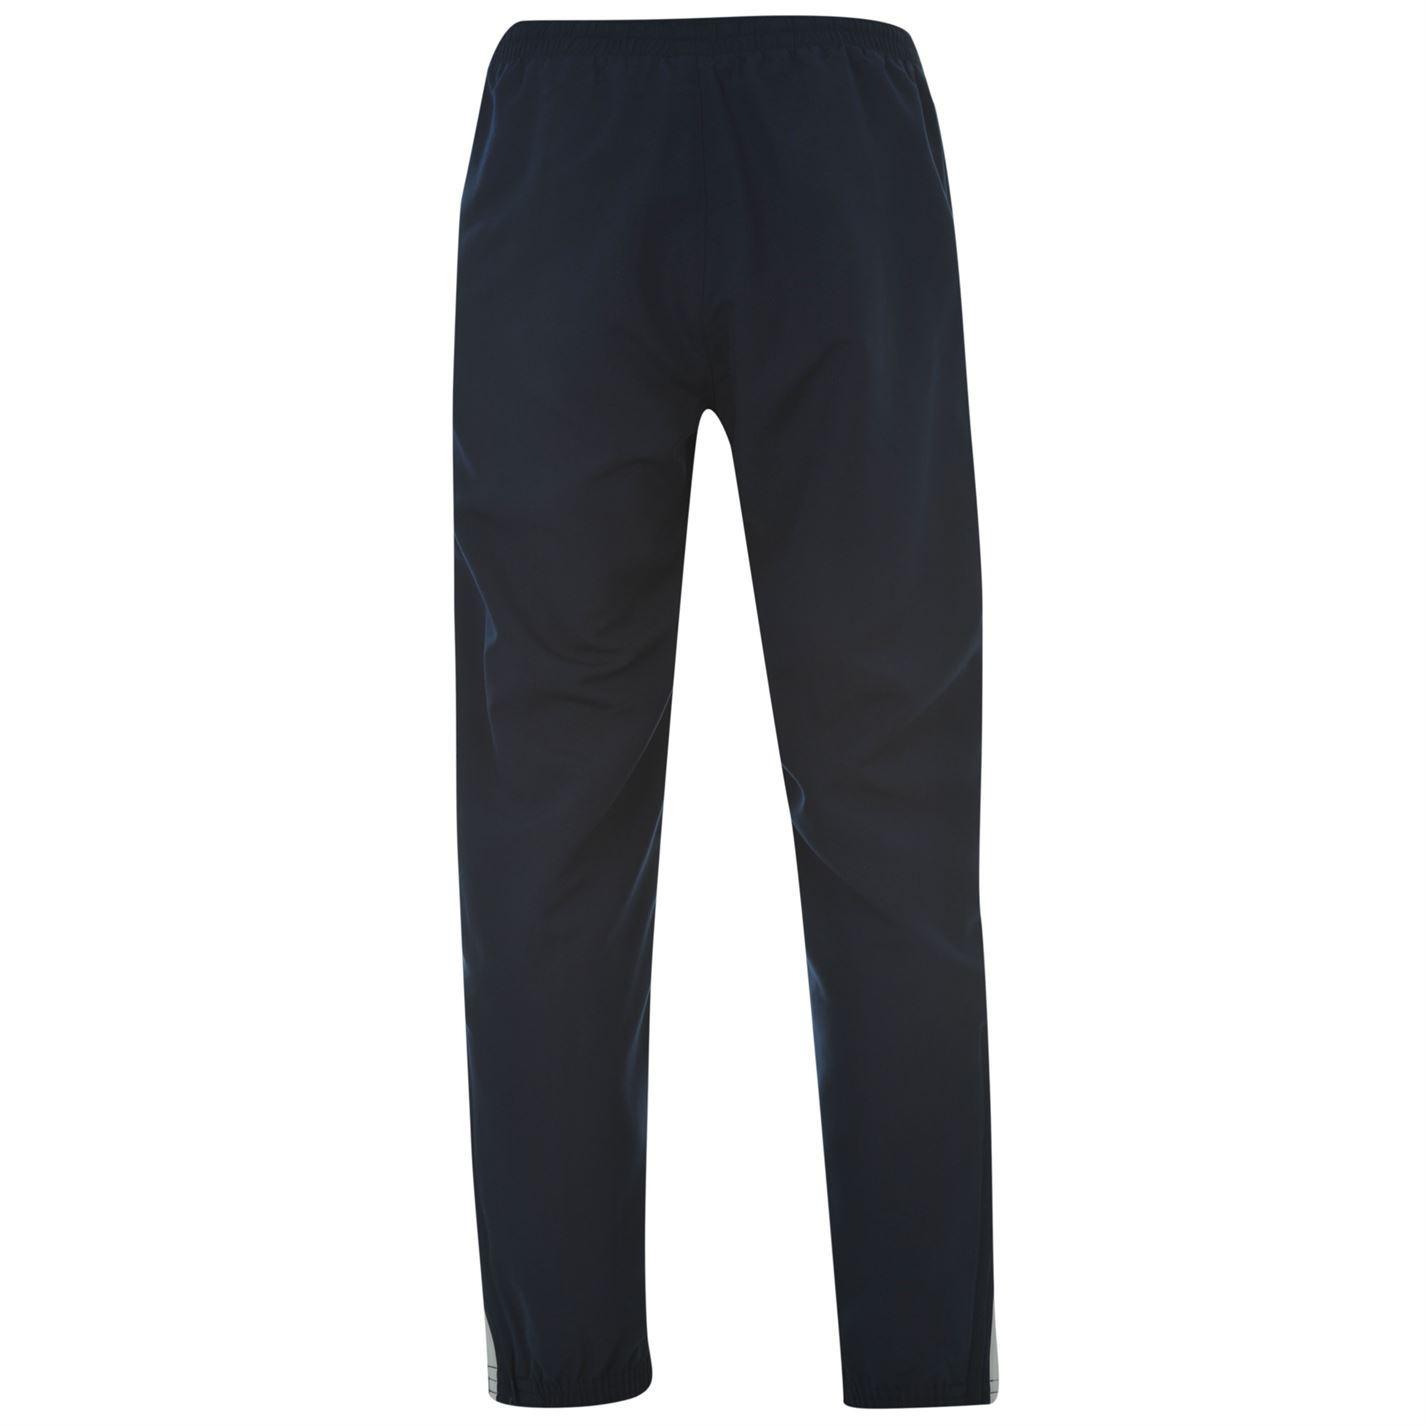 ... Tuta sportiva ADIDAS Samson 2 Bottoms Sweatpants Mens Navy White  Pantaloni Joggers a3030962cd28